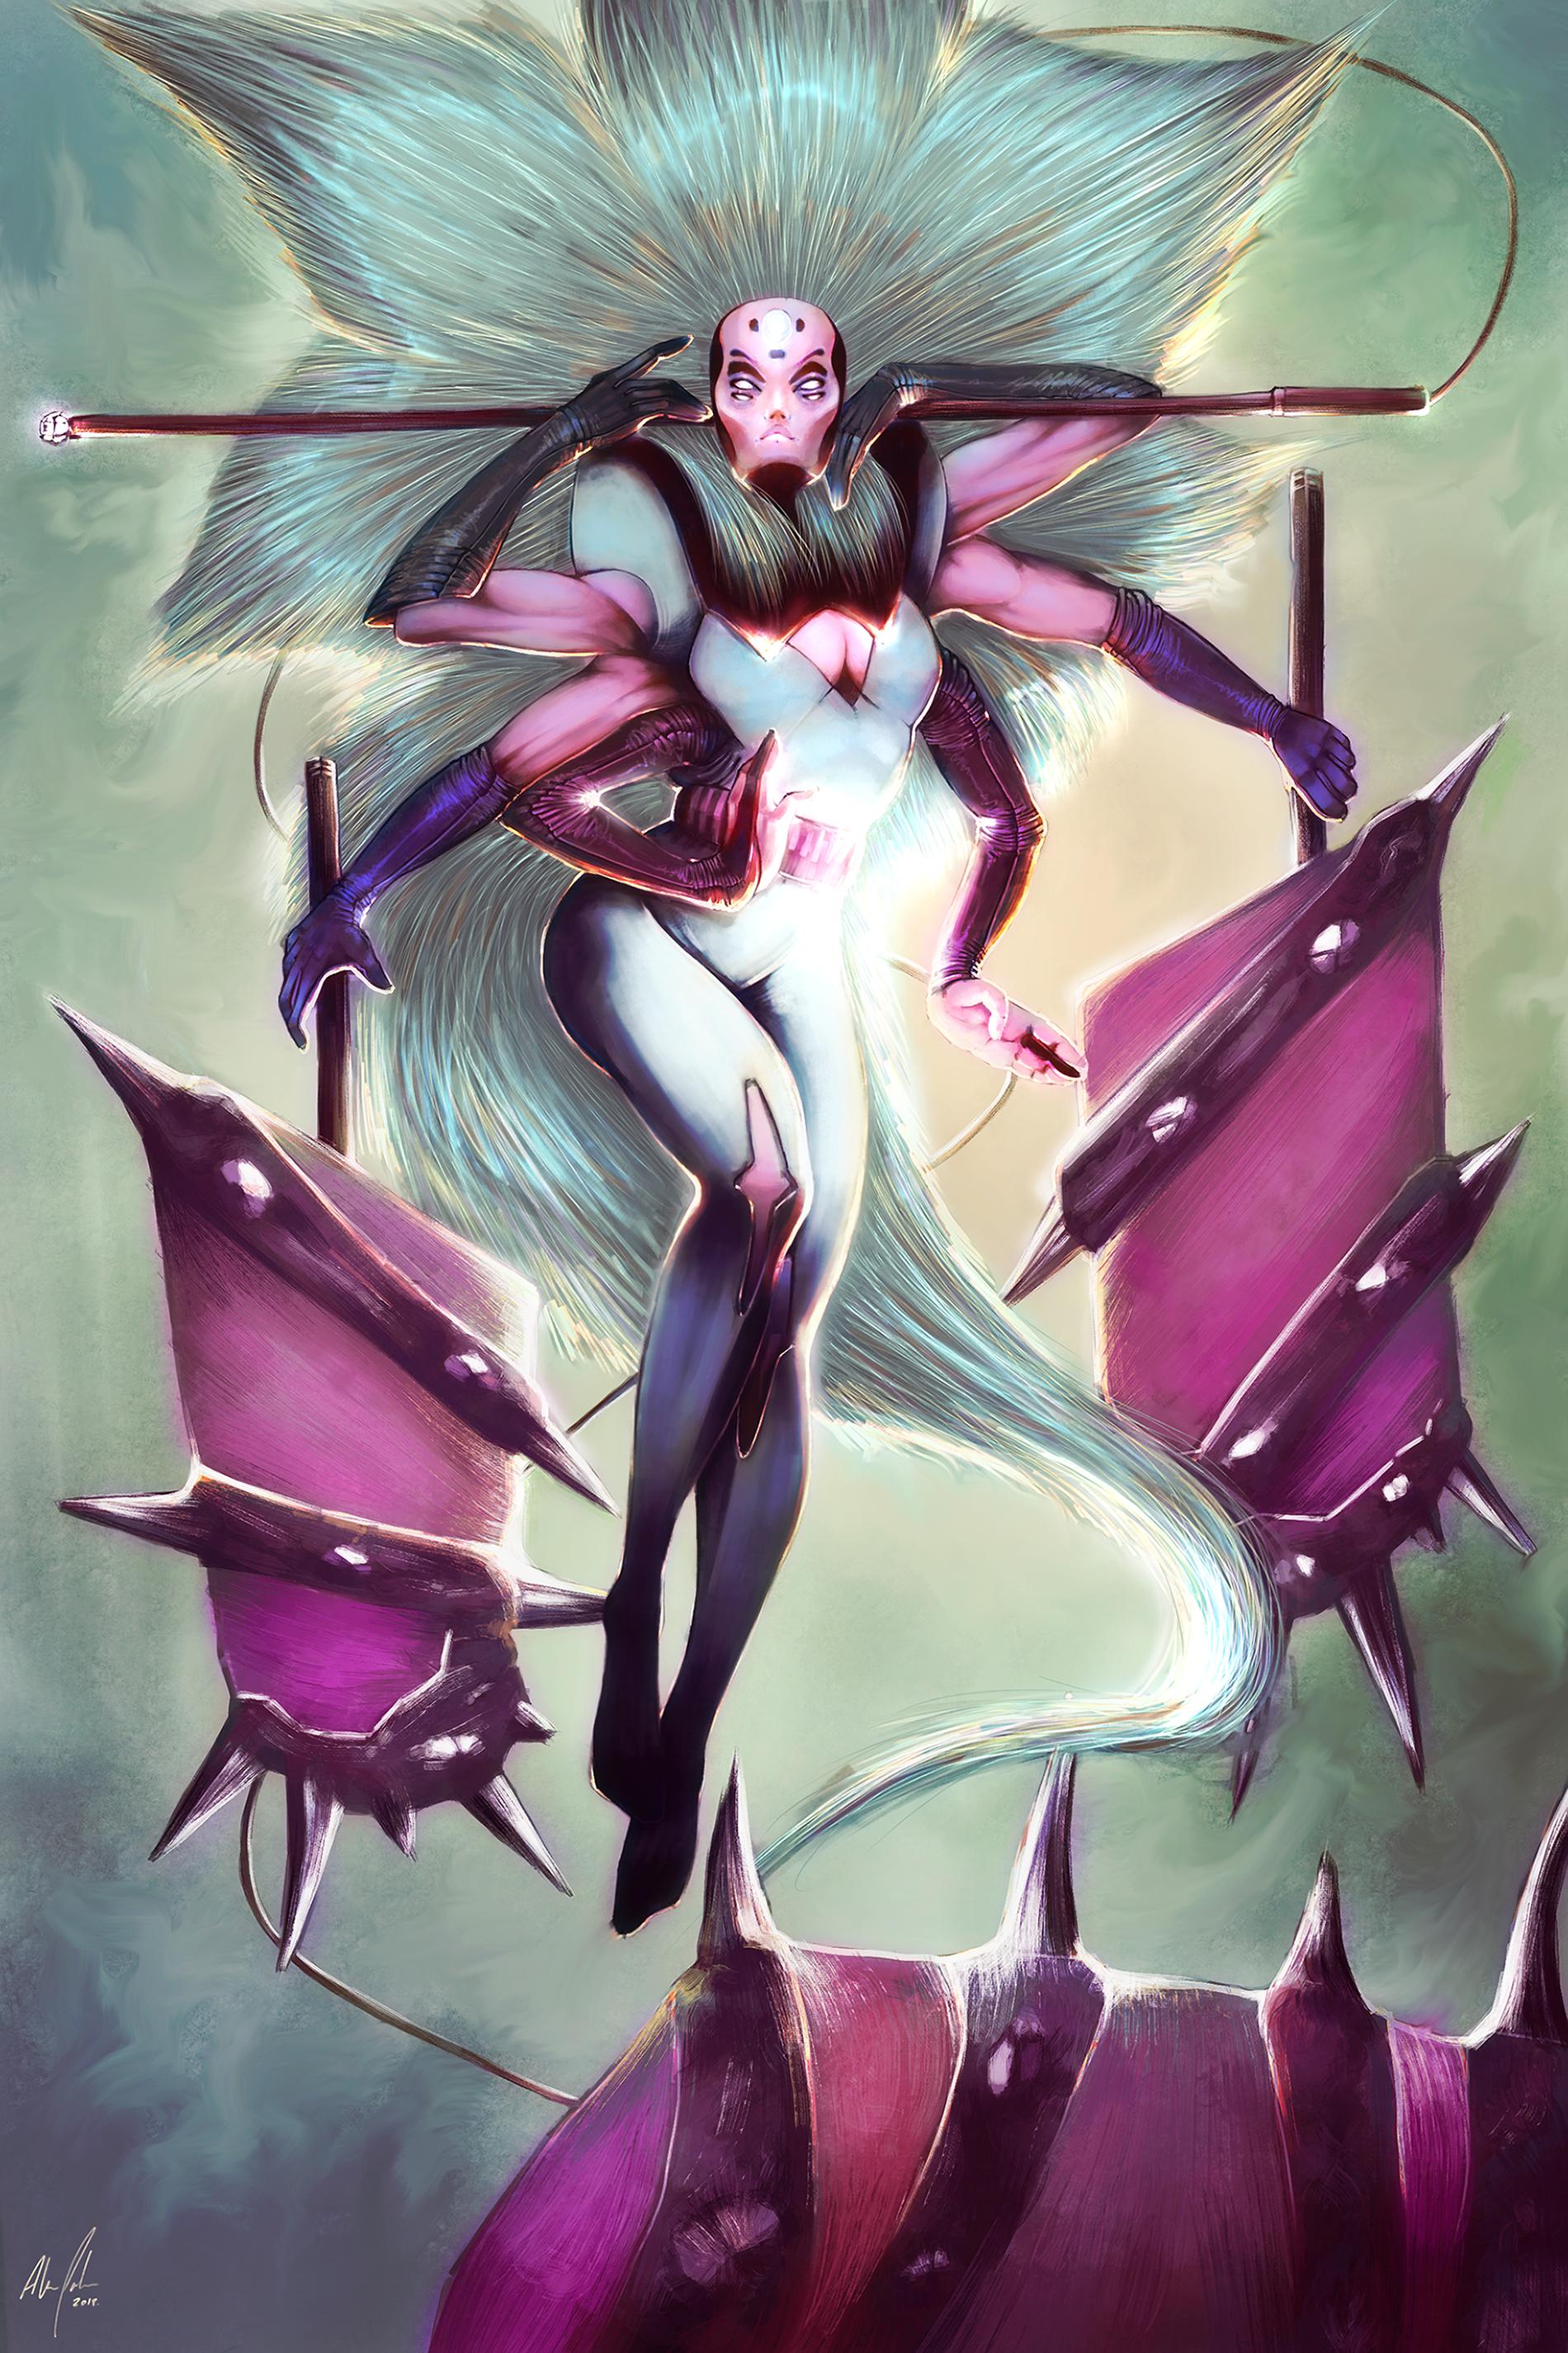 Steven Universe - Alexandrite — Weasyl